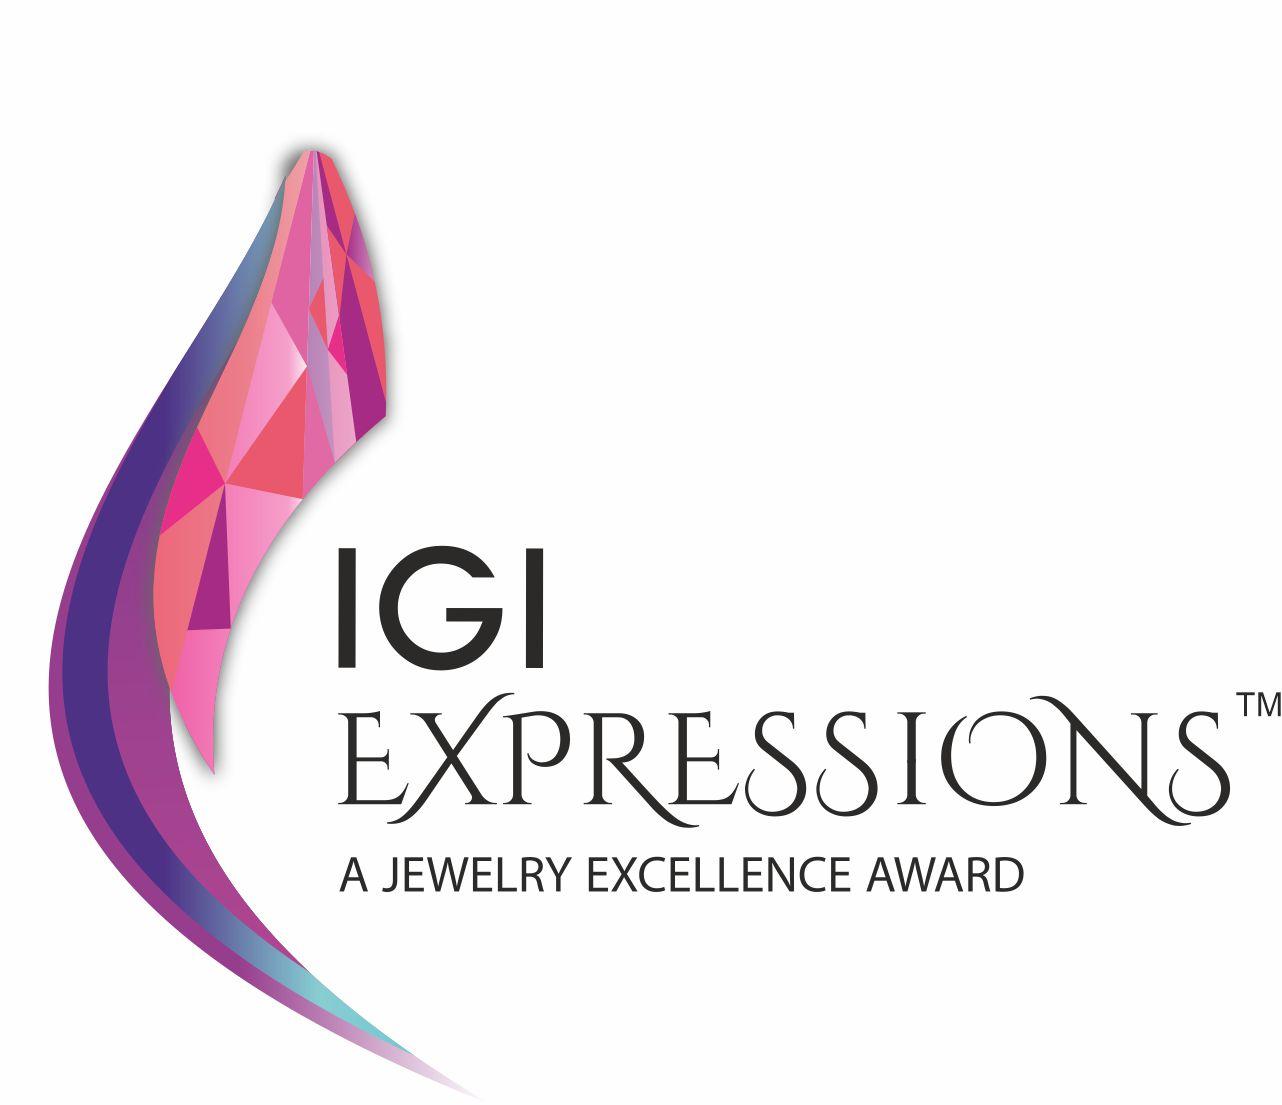 IGI expressions global excellence award